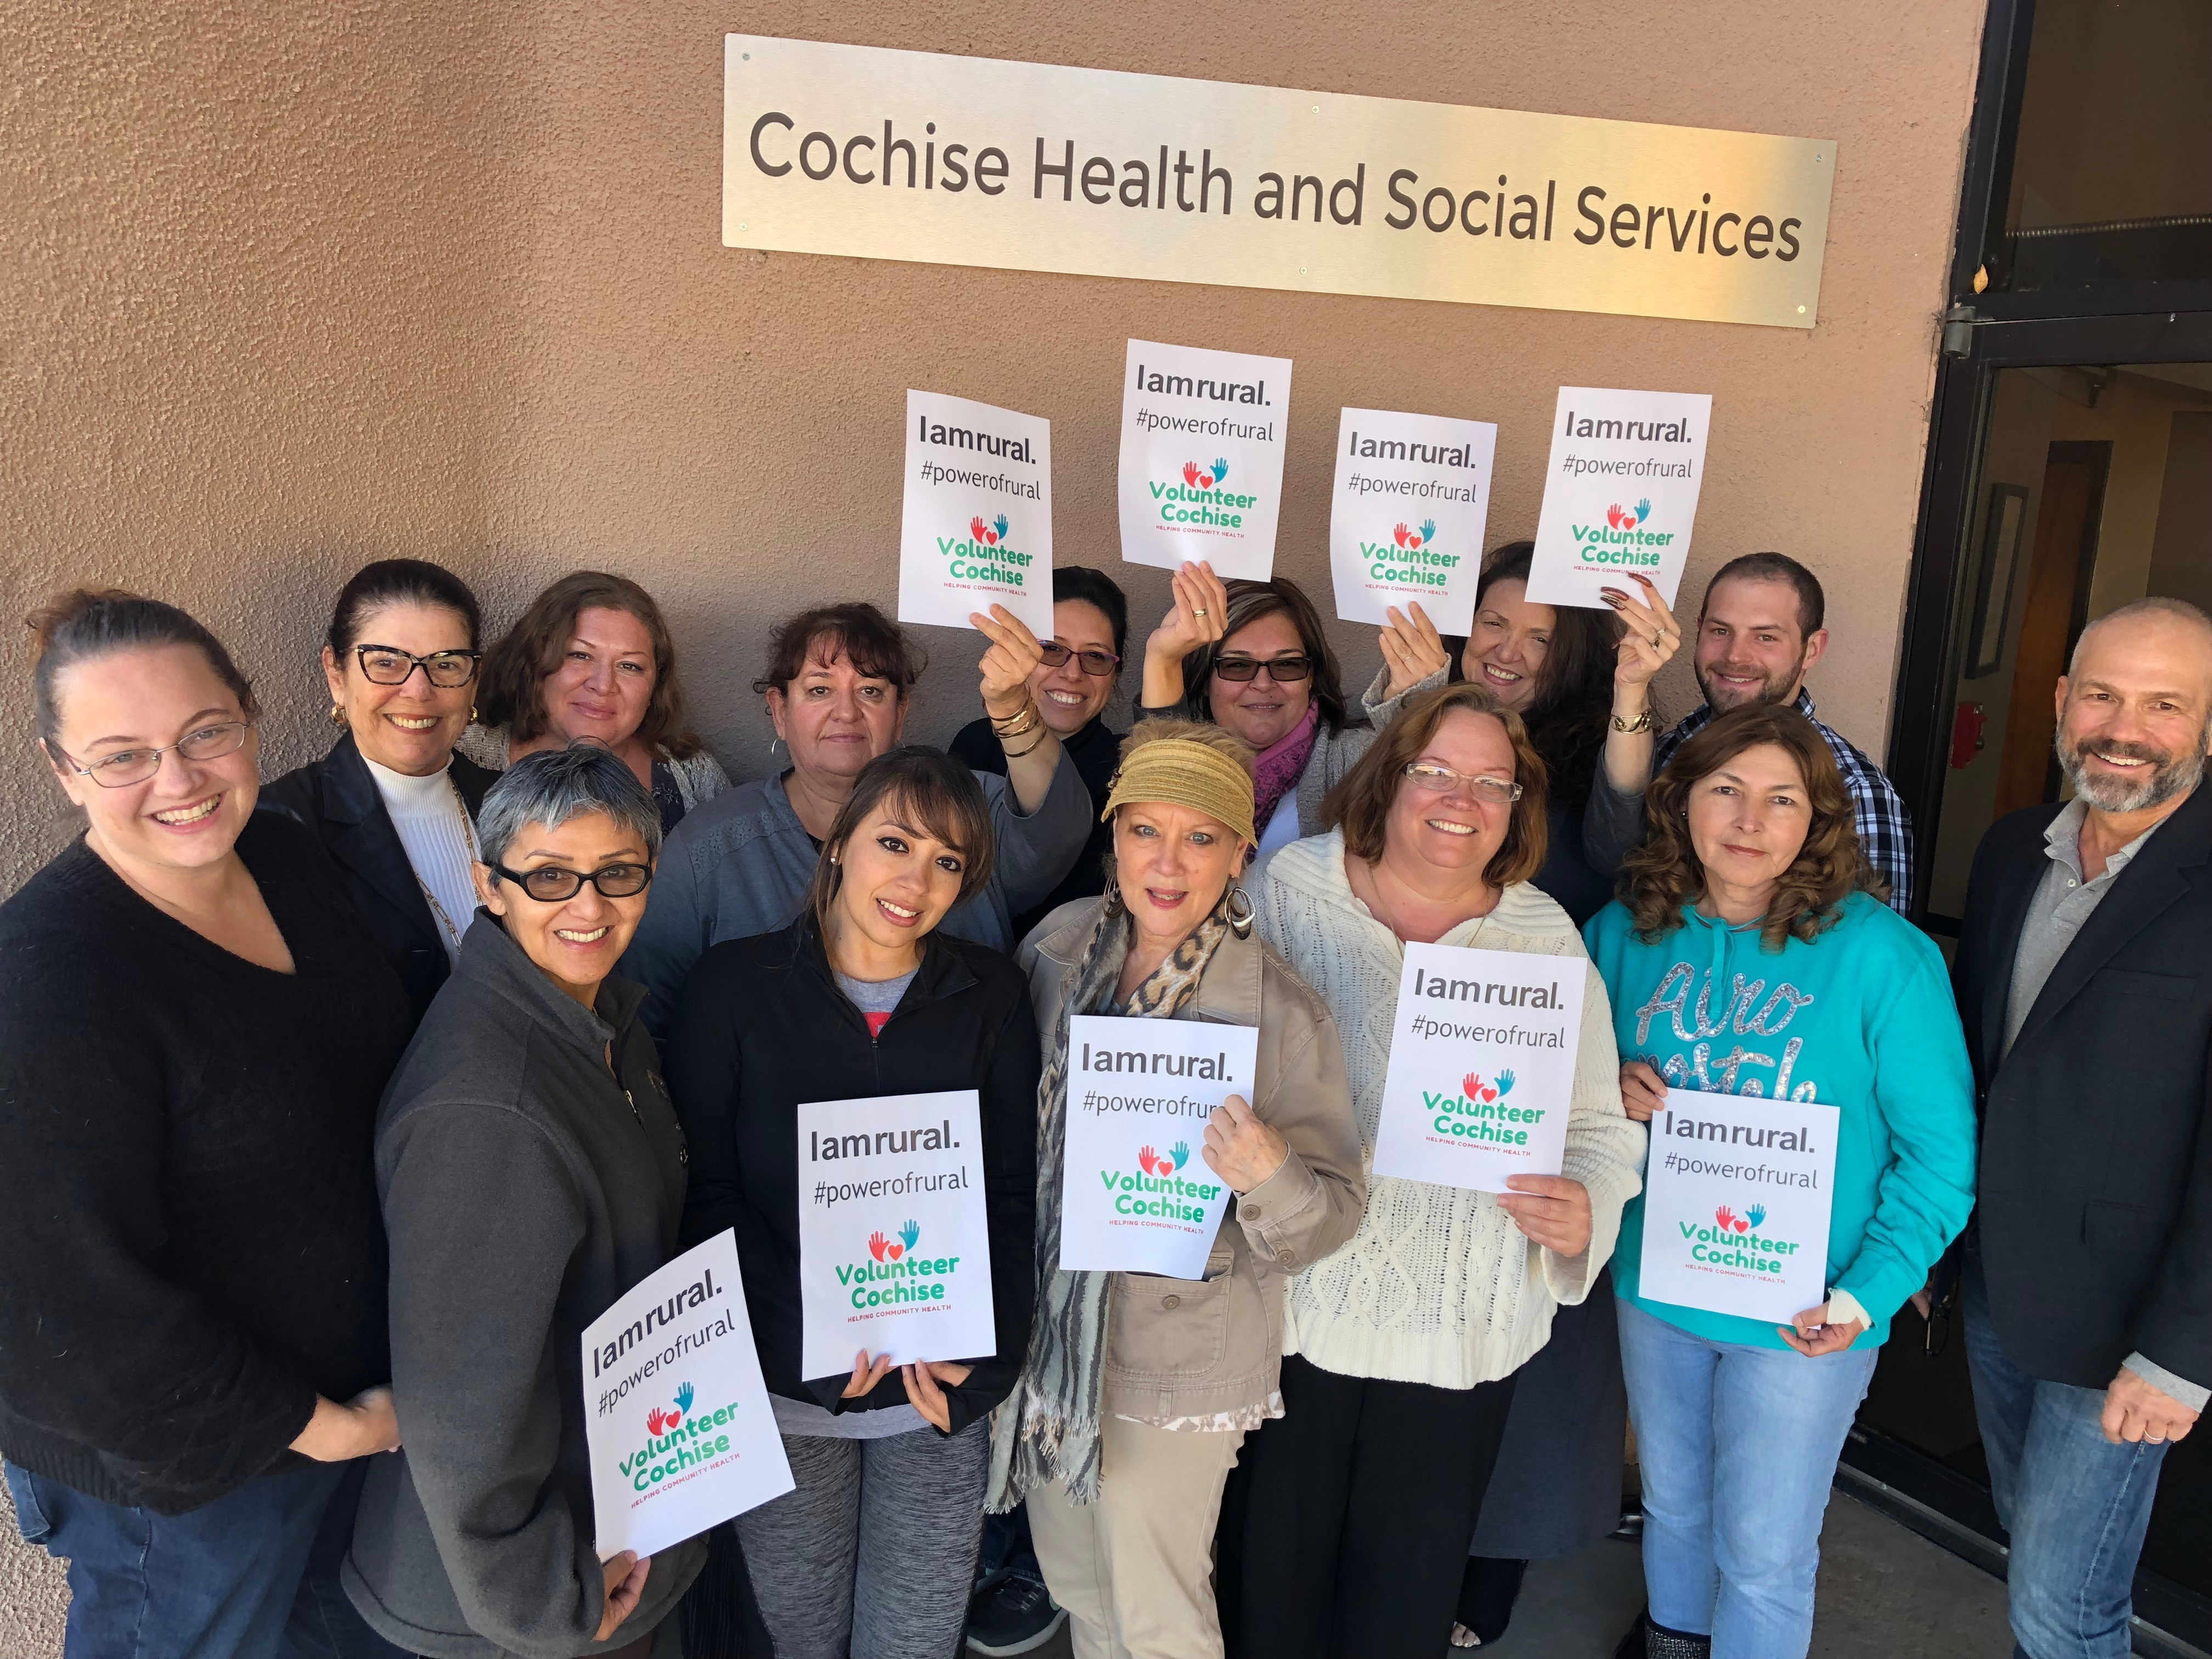 Cochise County | LinkedIn